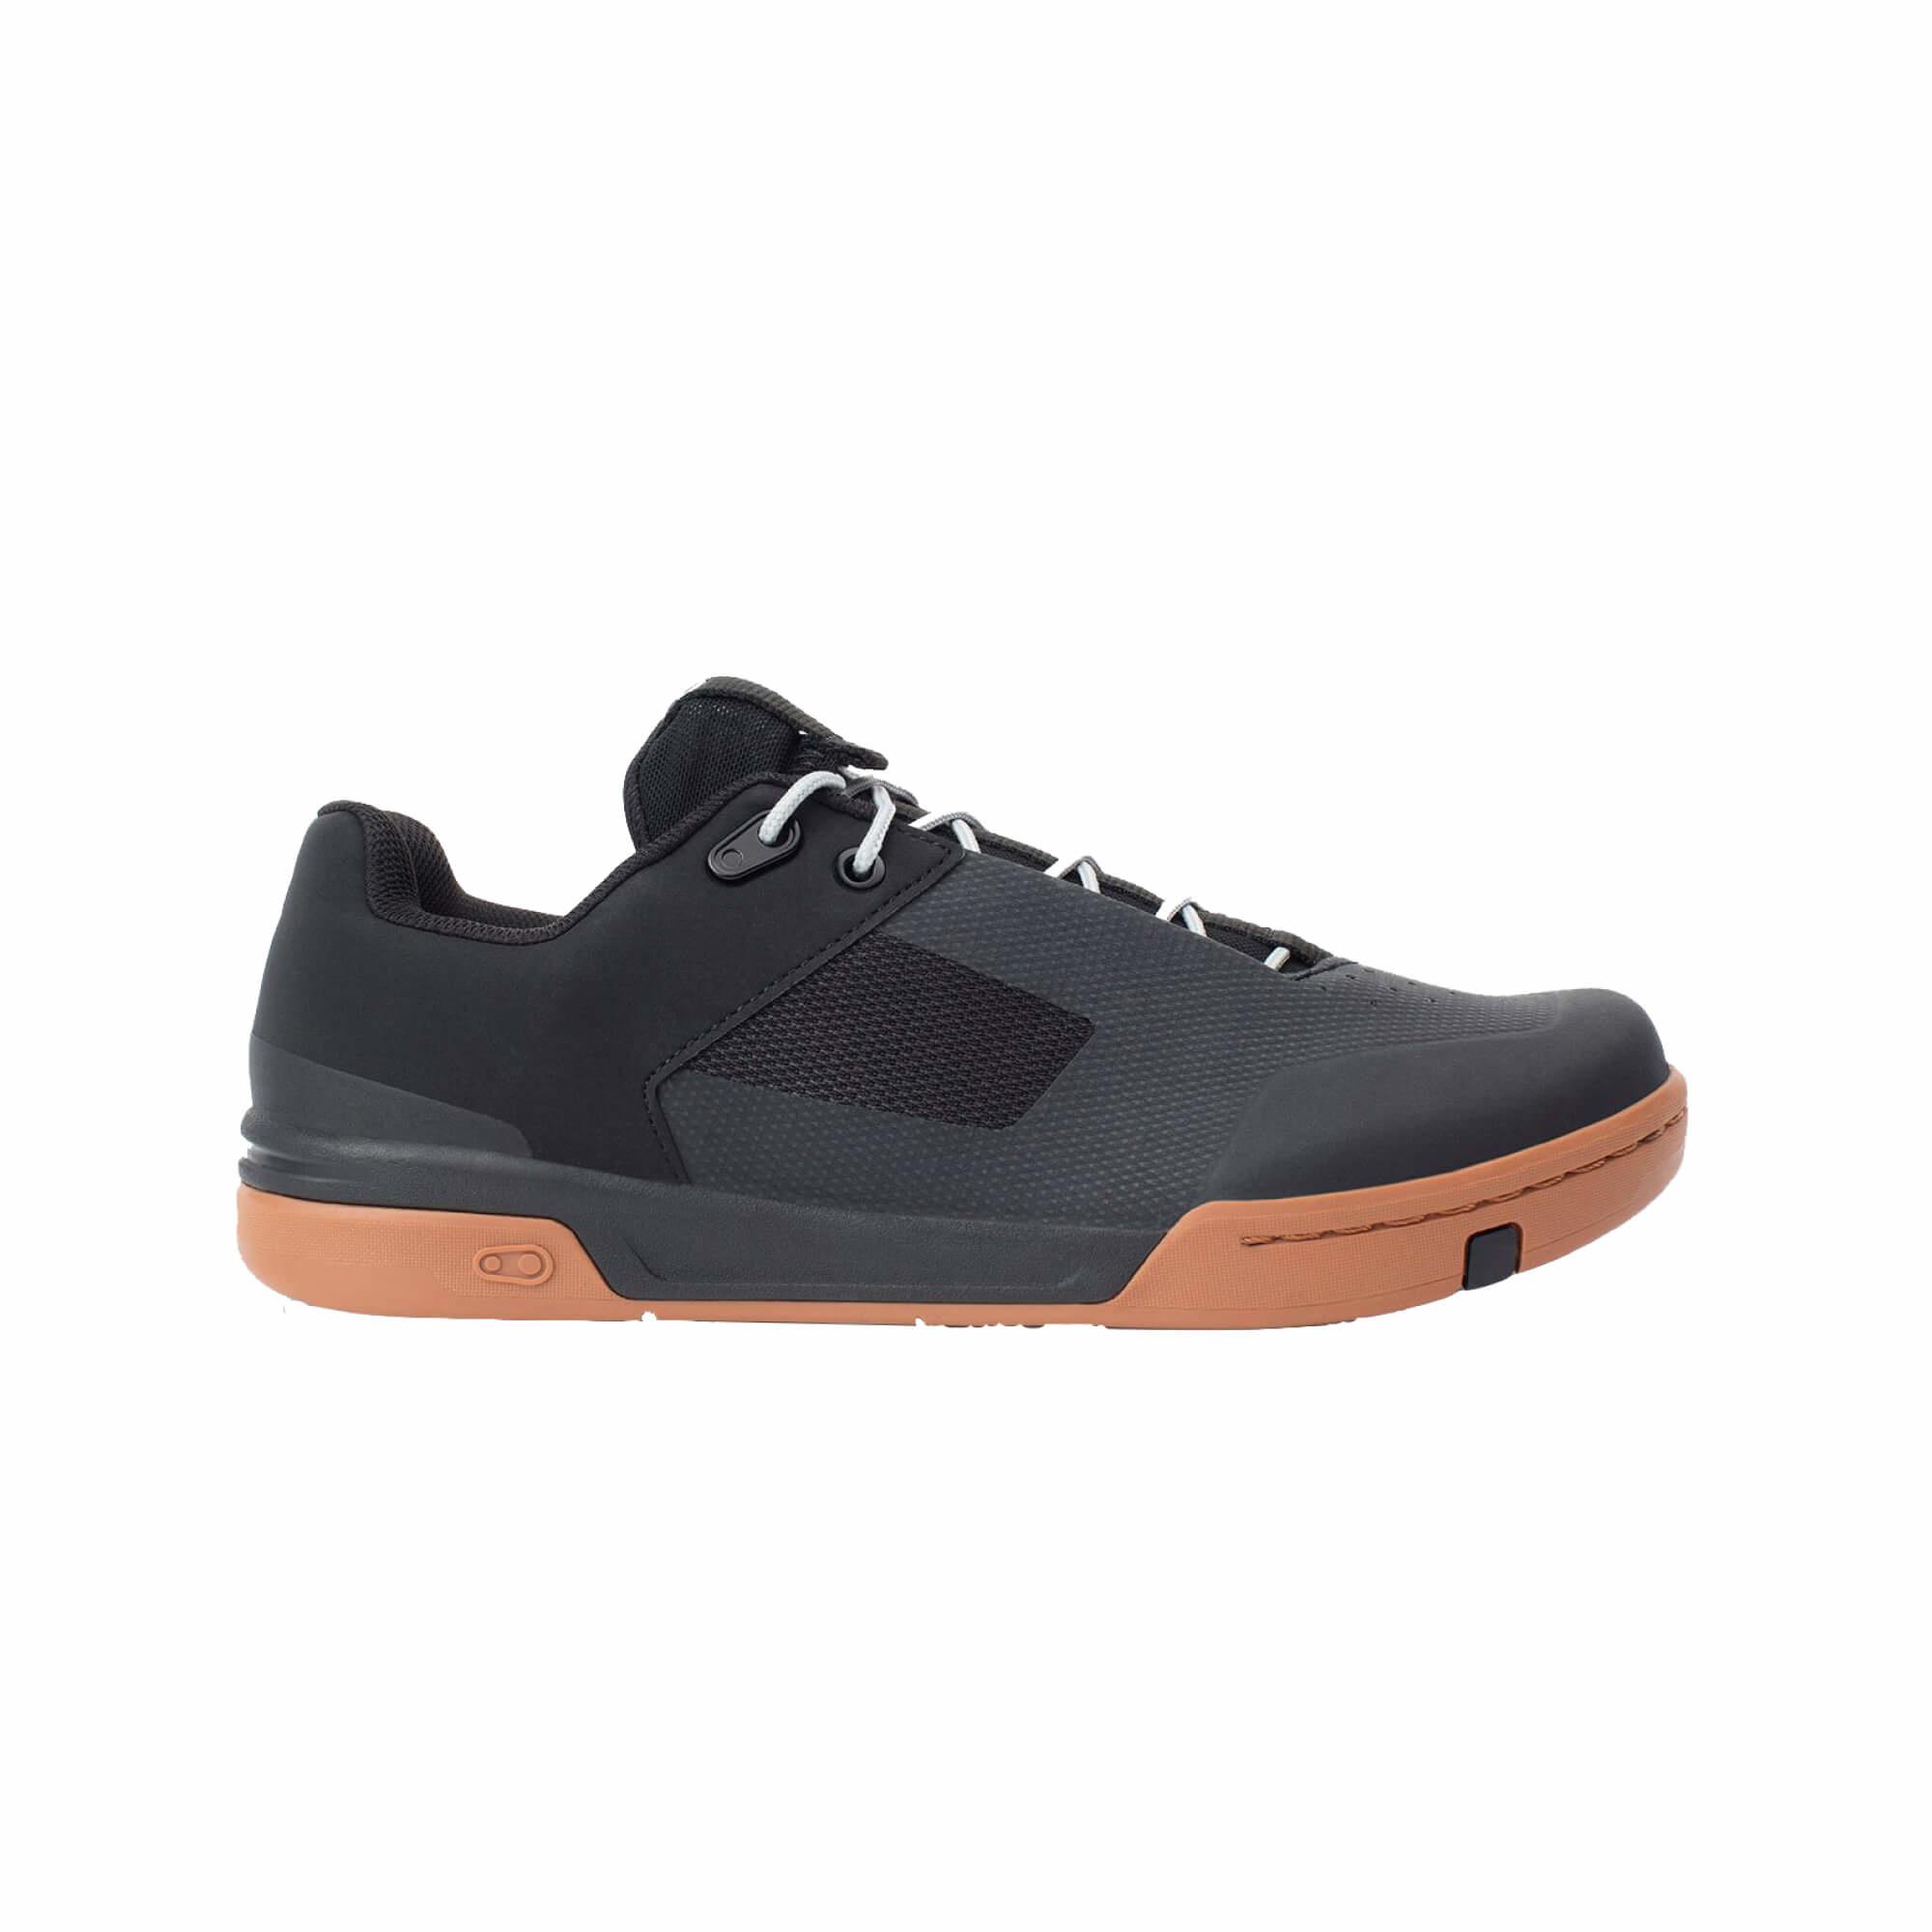 Shoe Stamp Lace Flat-1